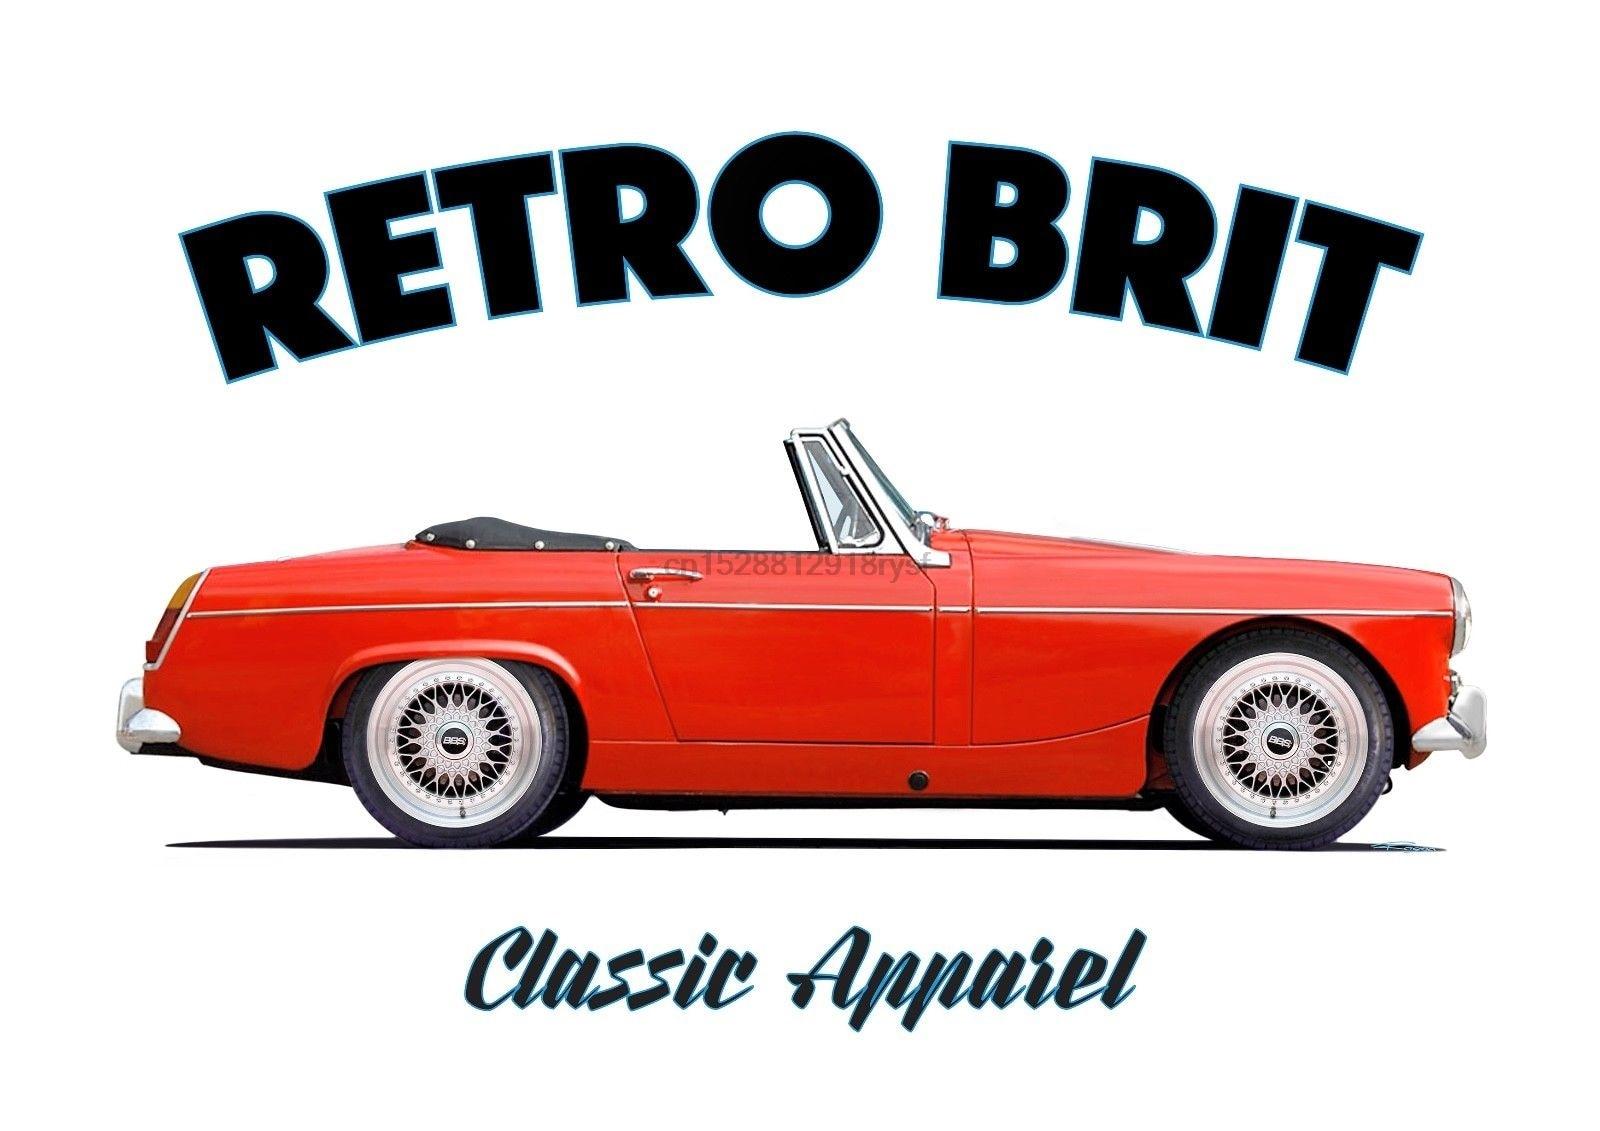 MG MIDGET de la serie 1 de camiseta RETRO BRIT ¡Coche clásico! ¿MORRIS garajes? BMC